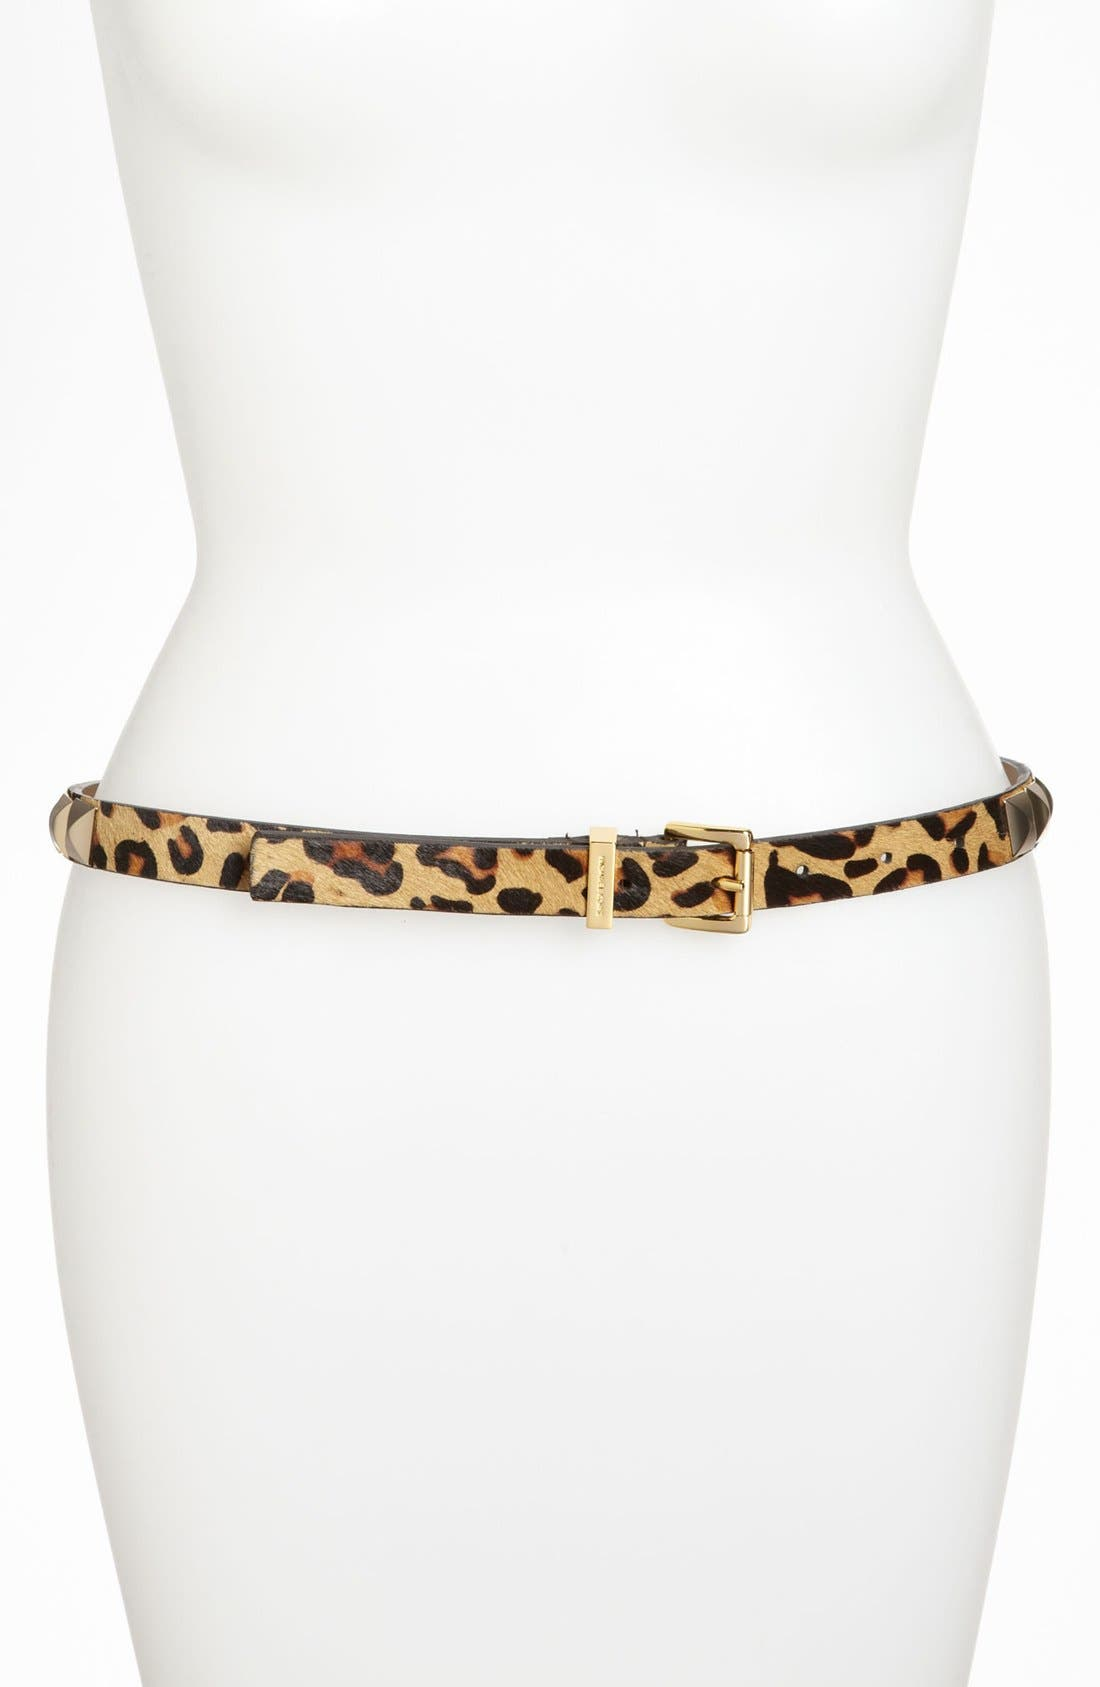 Alternate Image 1 Selected - MICHAEL Michael Kors Studded Calf Hair Belt